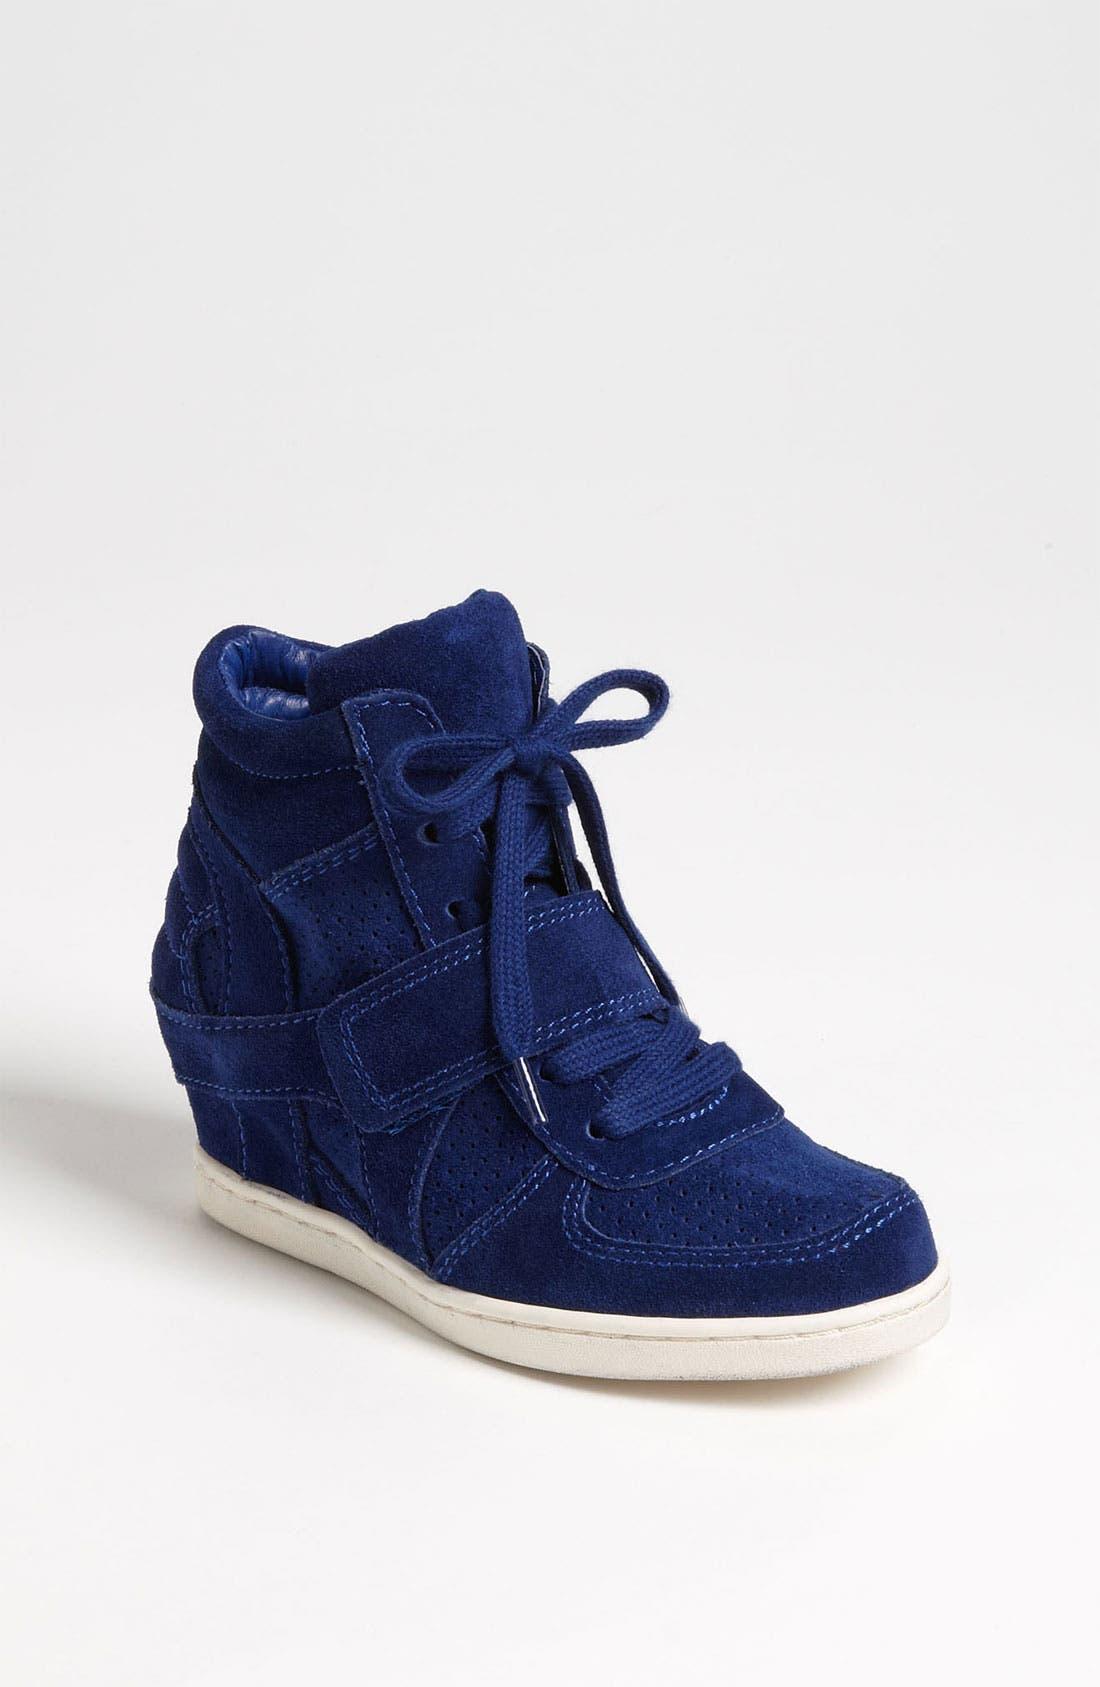 Alternate Image 1 Selected - Ash 'Babe' Sneaker (Toddler, Little Kid & Big Kid)